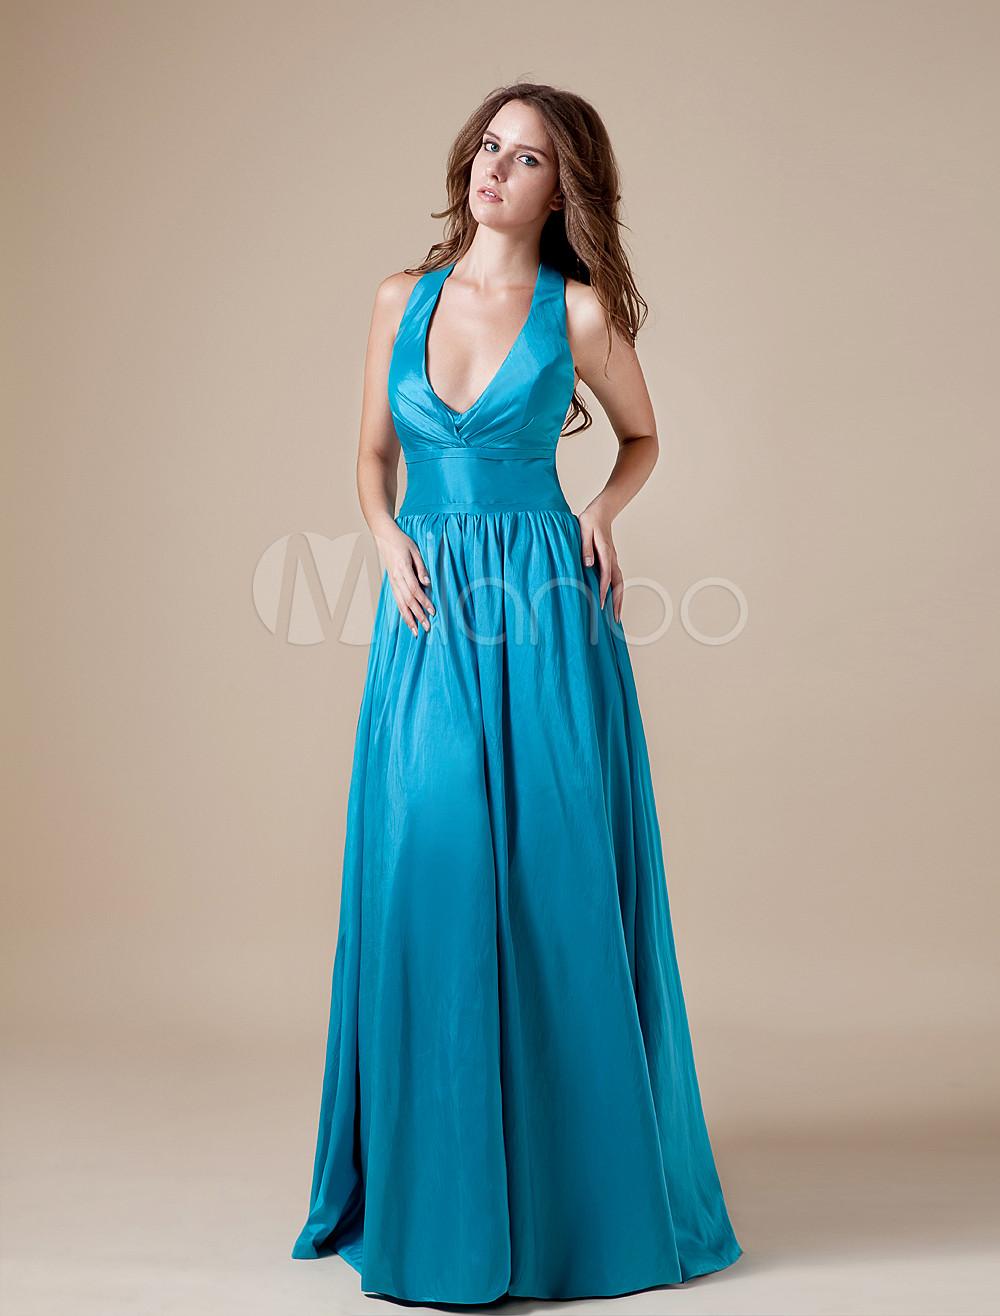 Vintage Blue Taffeta Halter Floor Length Bridesmaid Dress